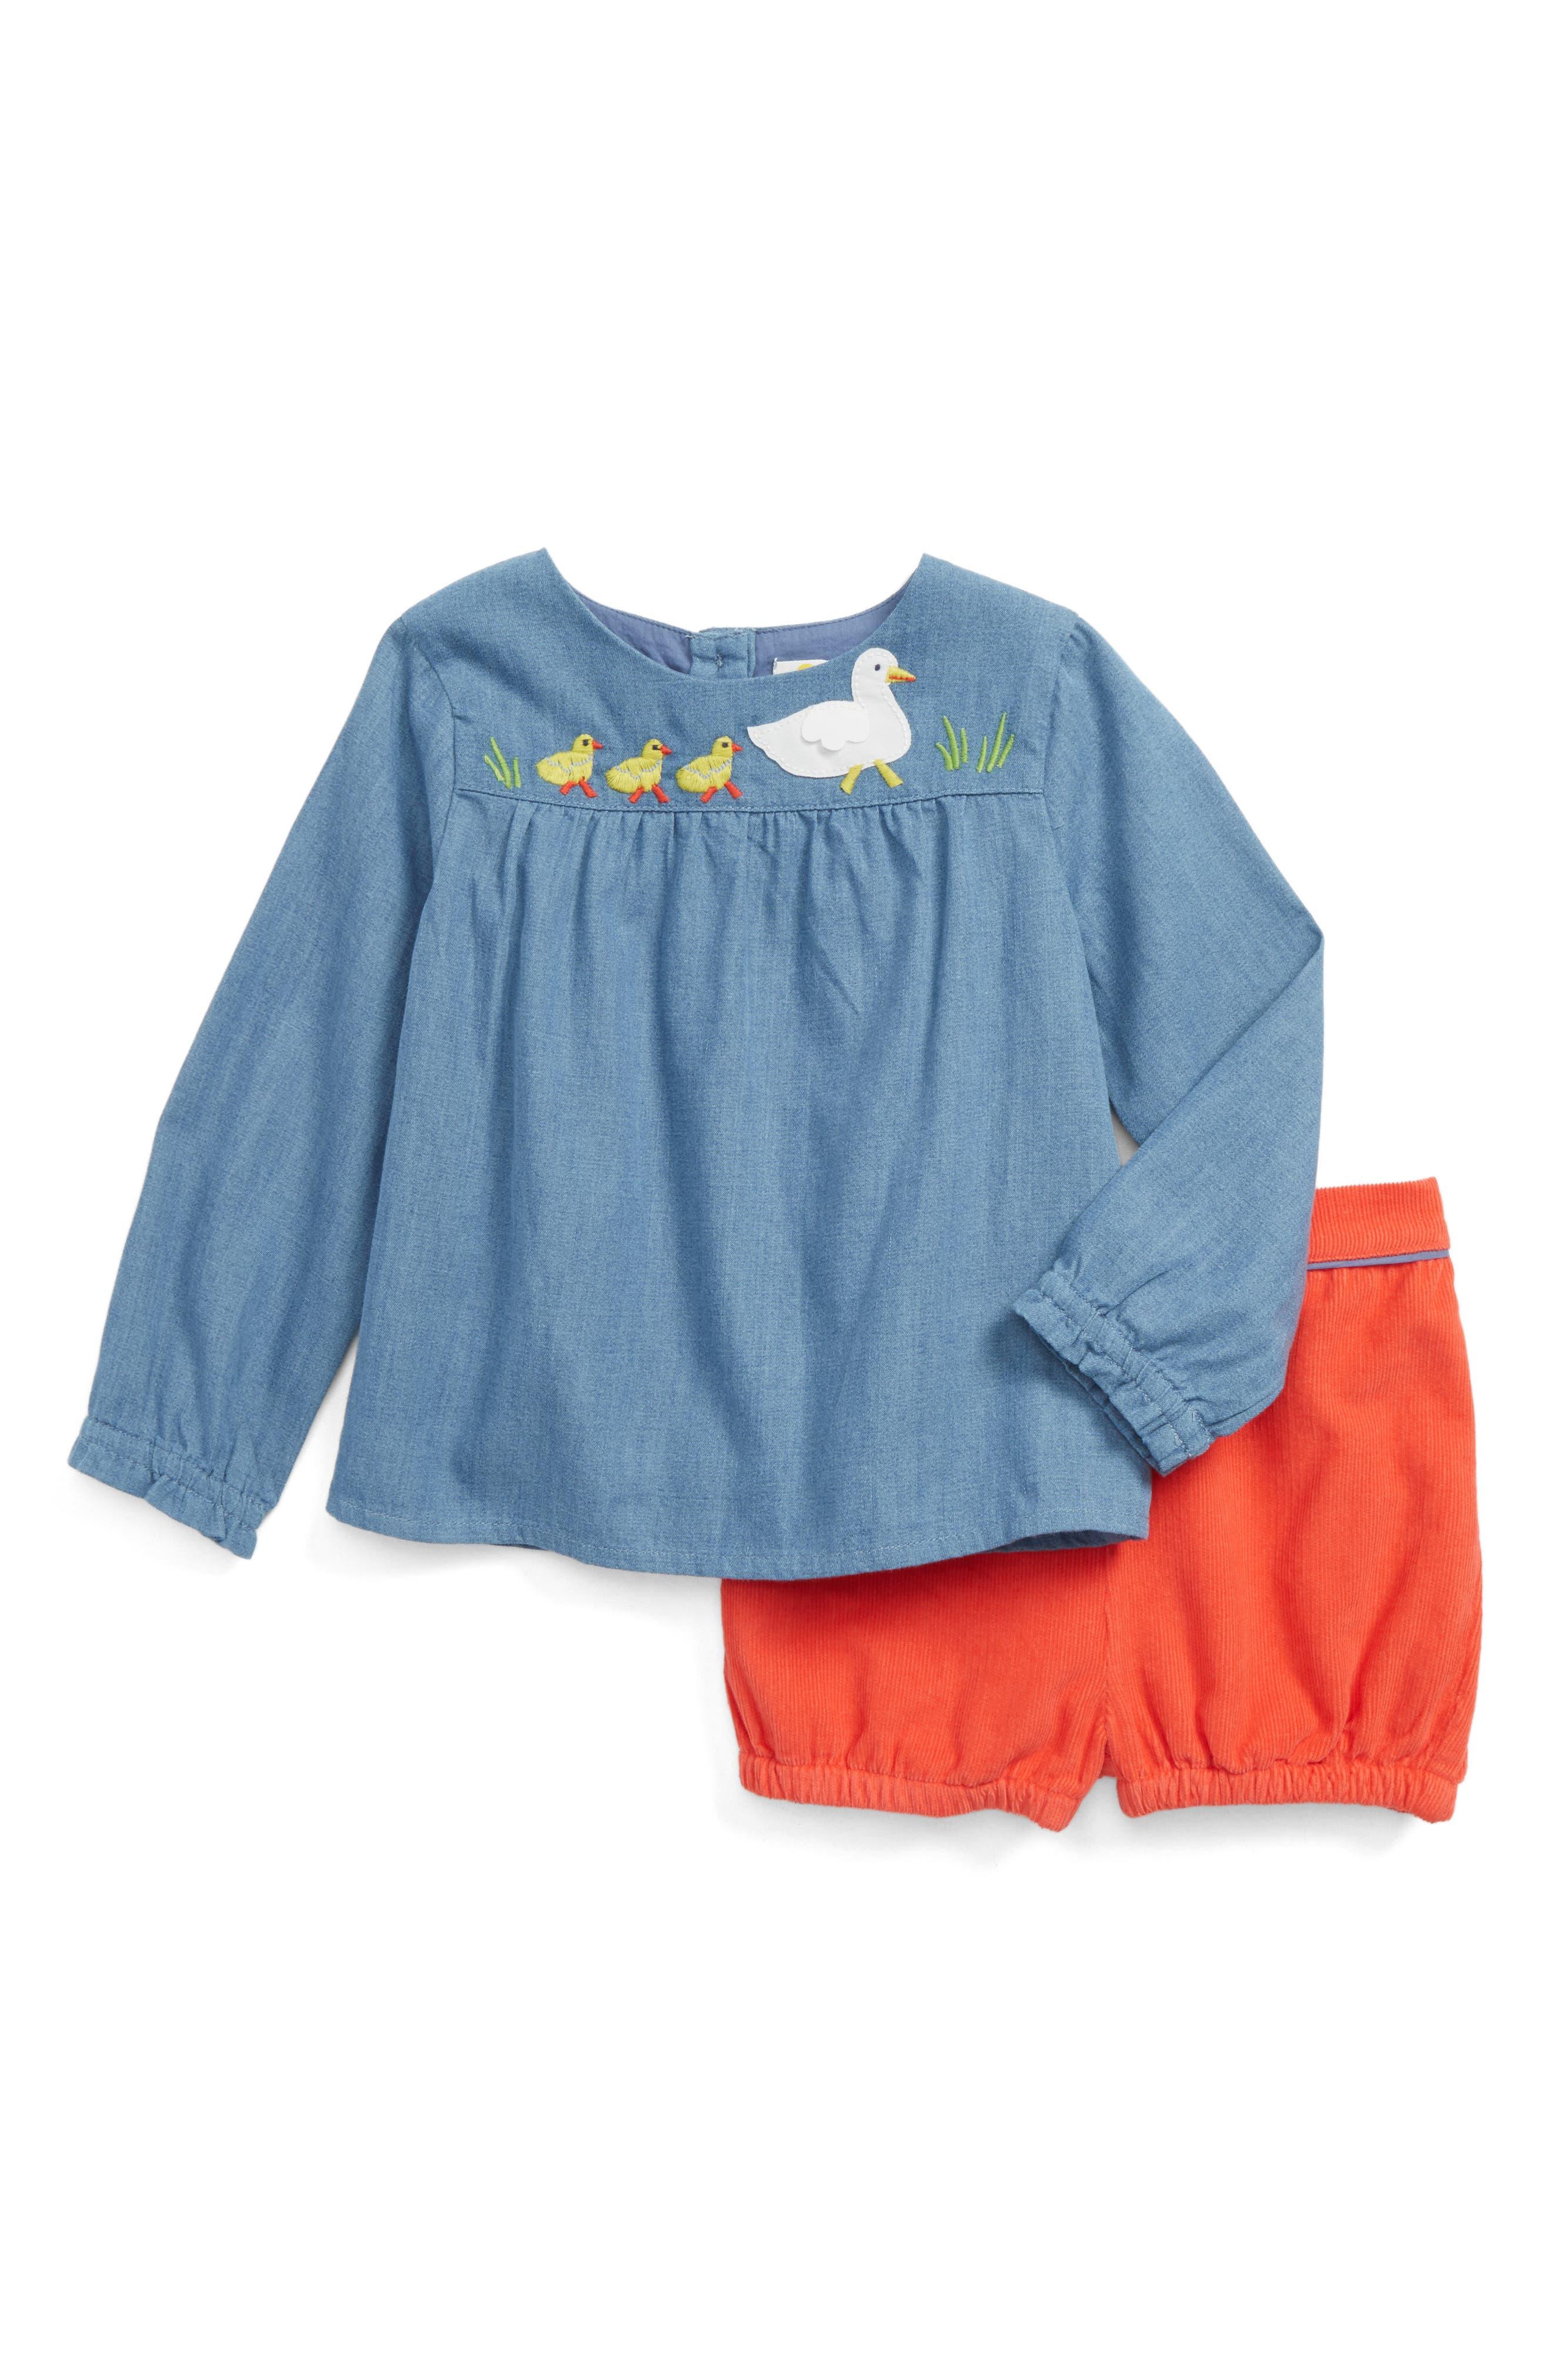 Mini Boden Woodland Top & Shorts Set (Baby Girls & Toddler Girls)